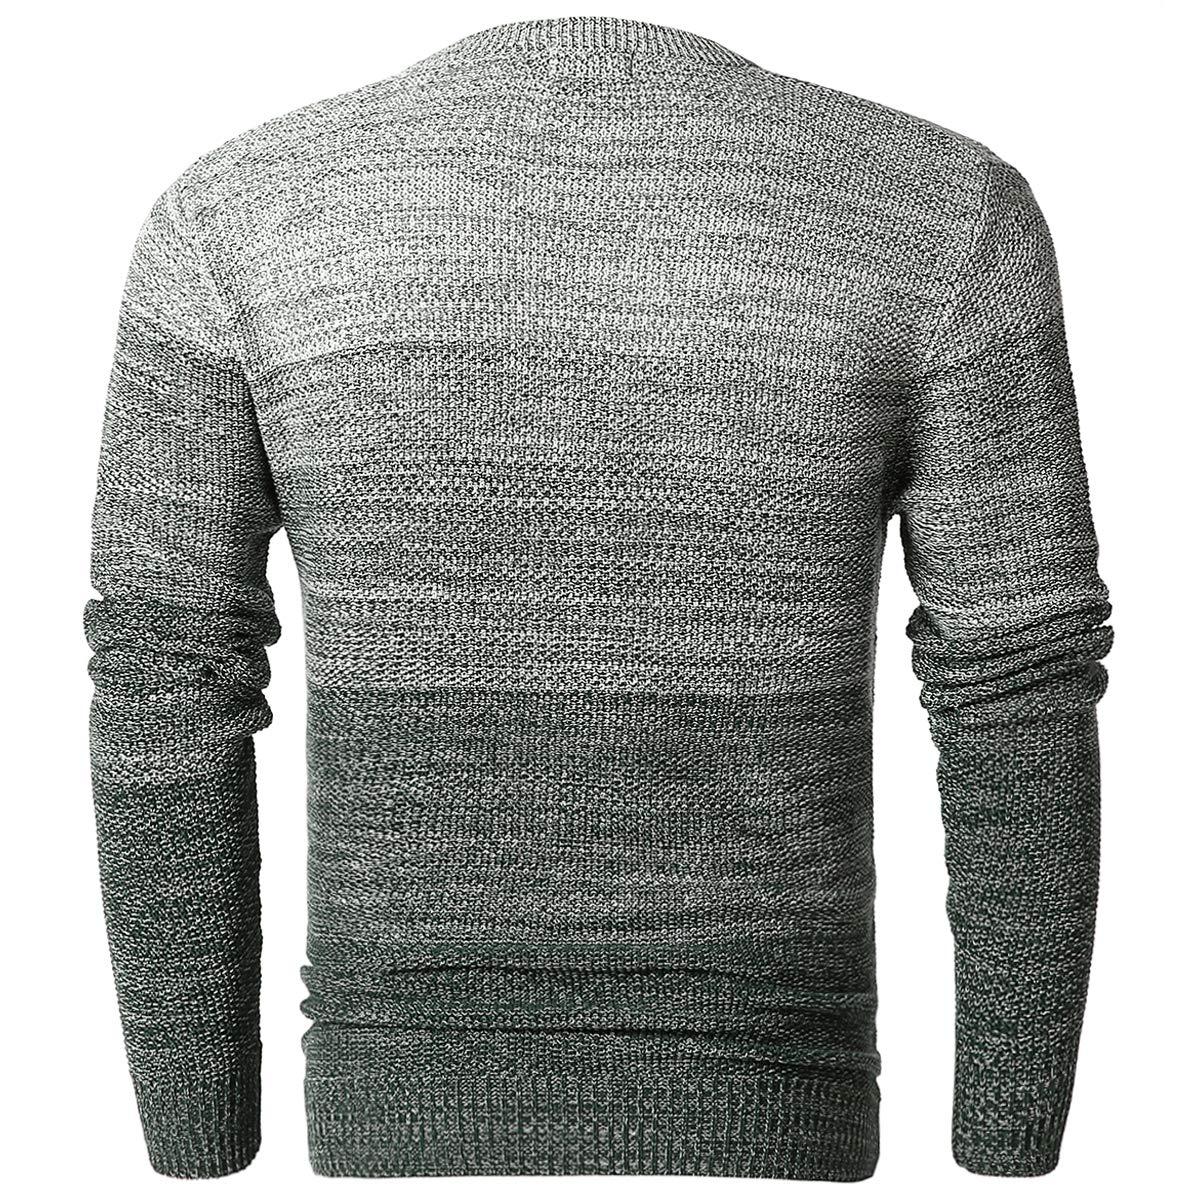 72c9cbd5b Amazon.com: Men's Stylish Gauge Knitted Pullover Crew Neck Sweater: Clothing